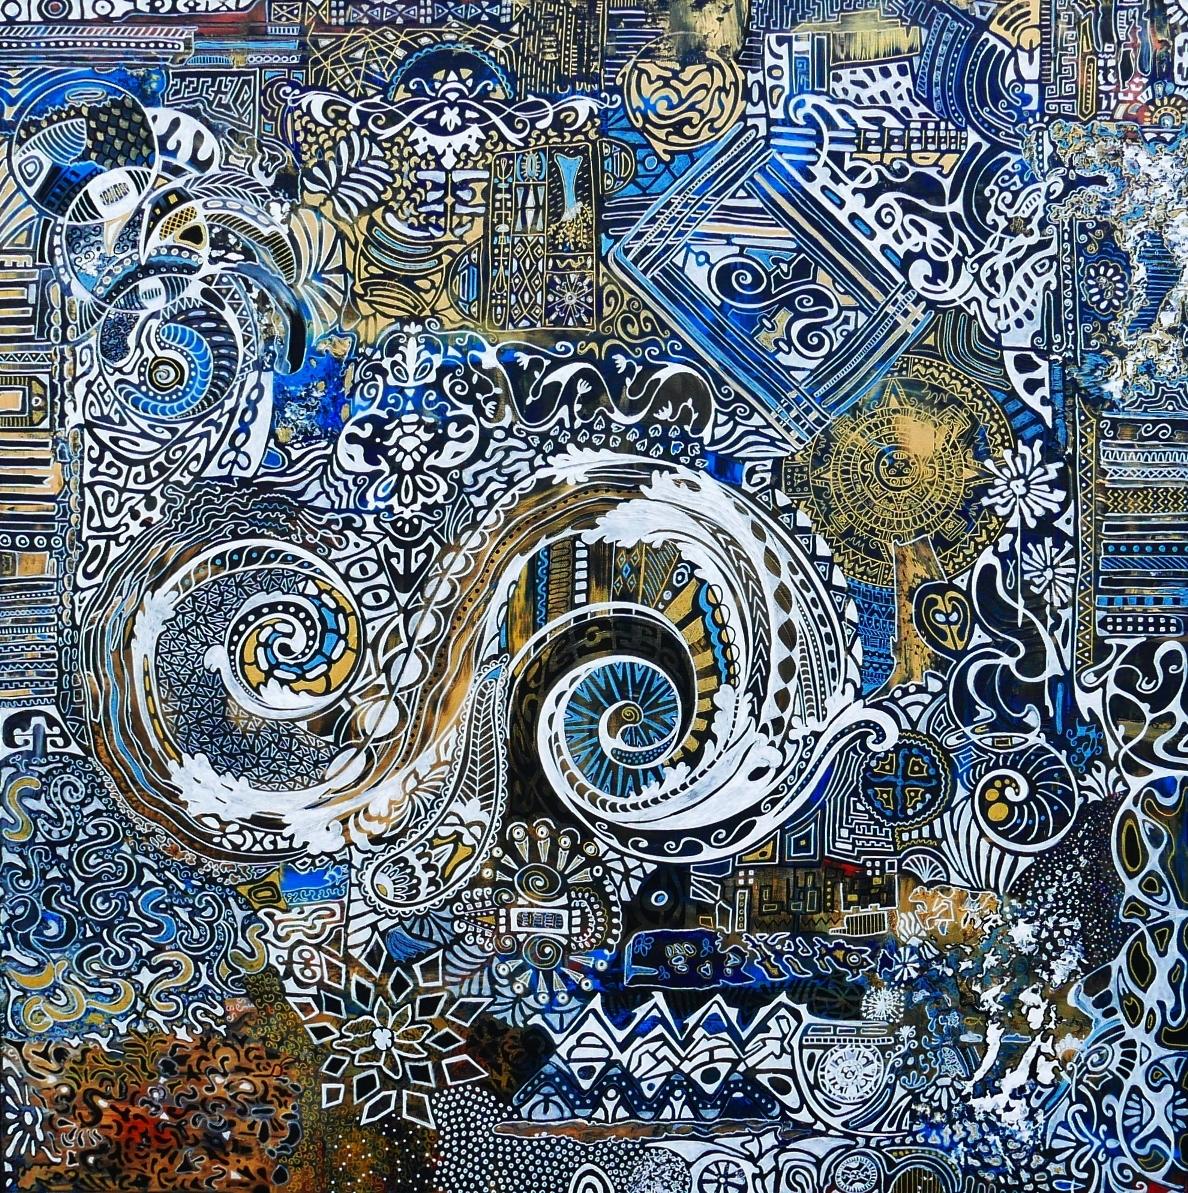 <h2>Yve BOUTDEBOIS</h2> Peintre